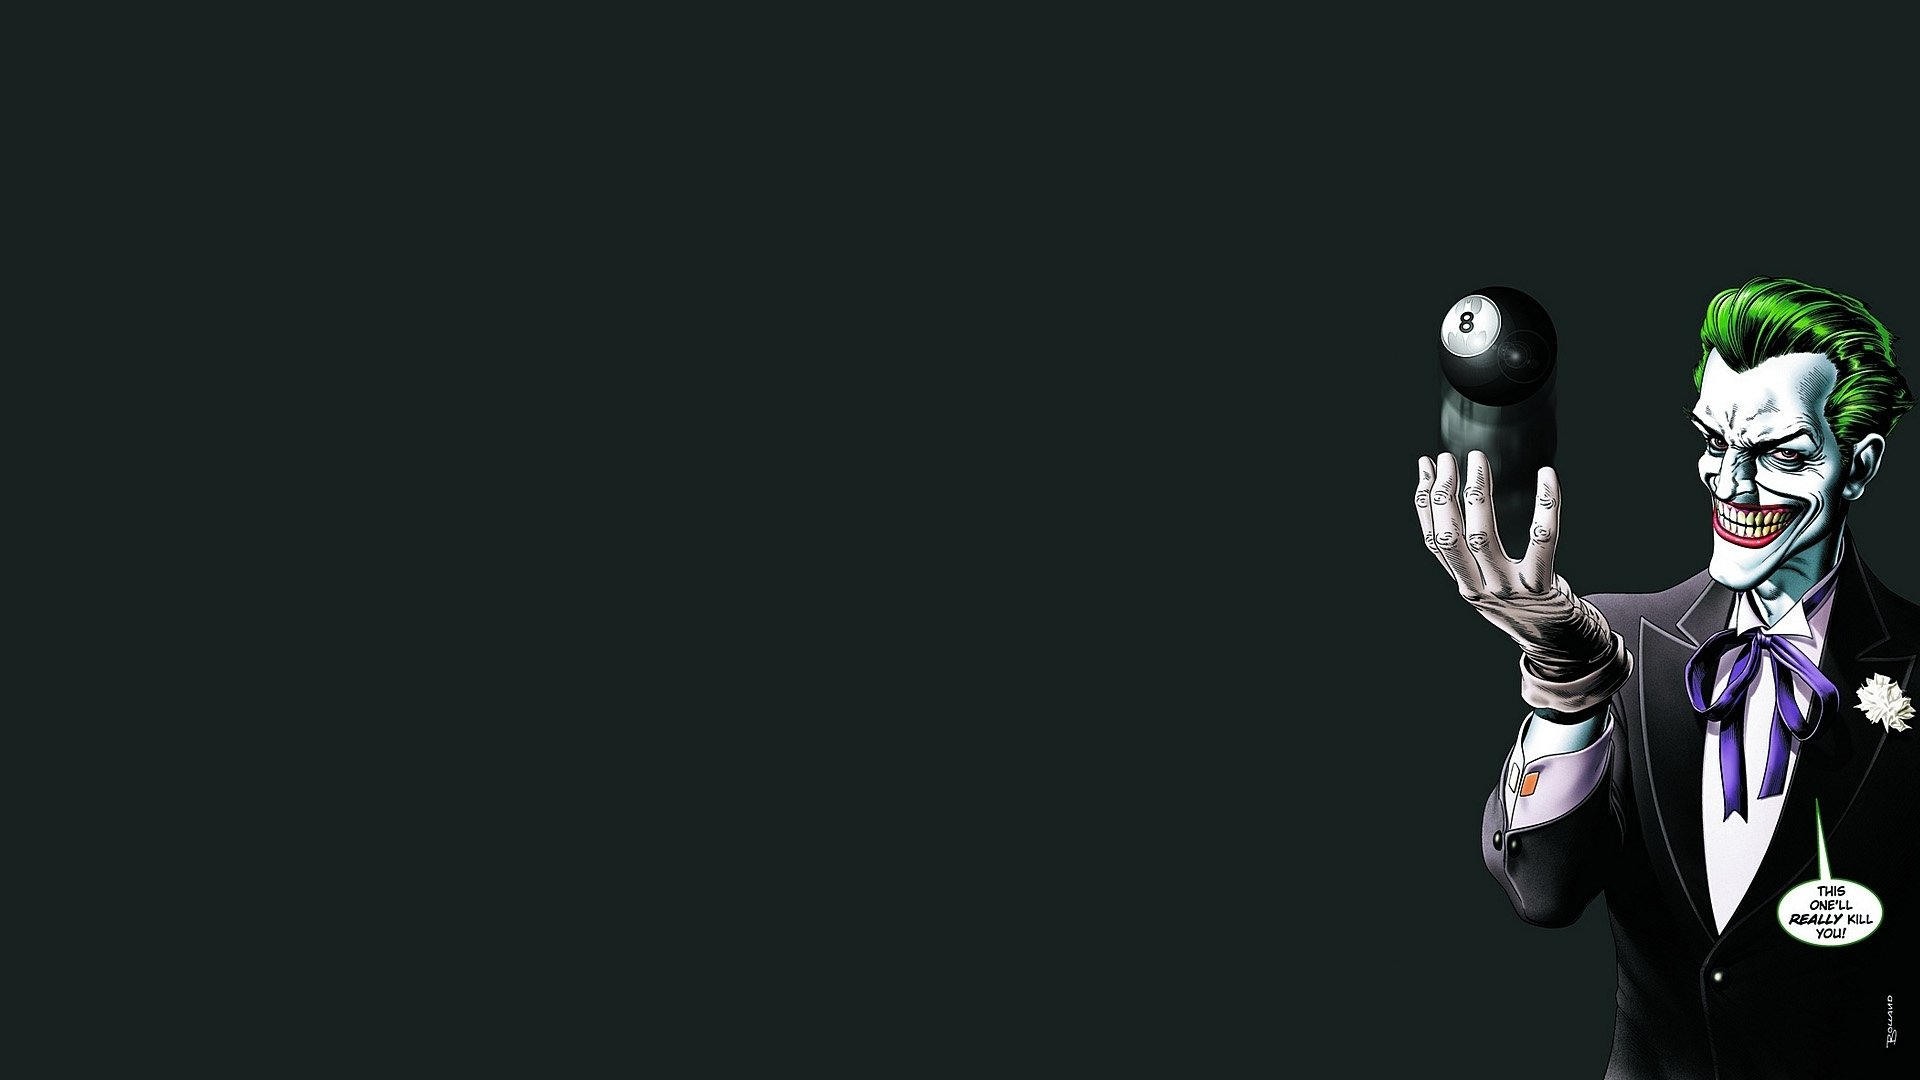 Joker HD Wallpaper   Background Image   1920x1080   ID ...